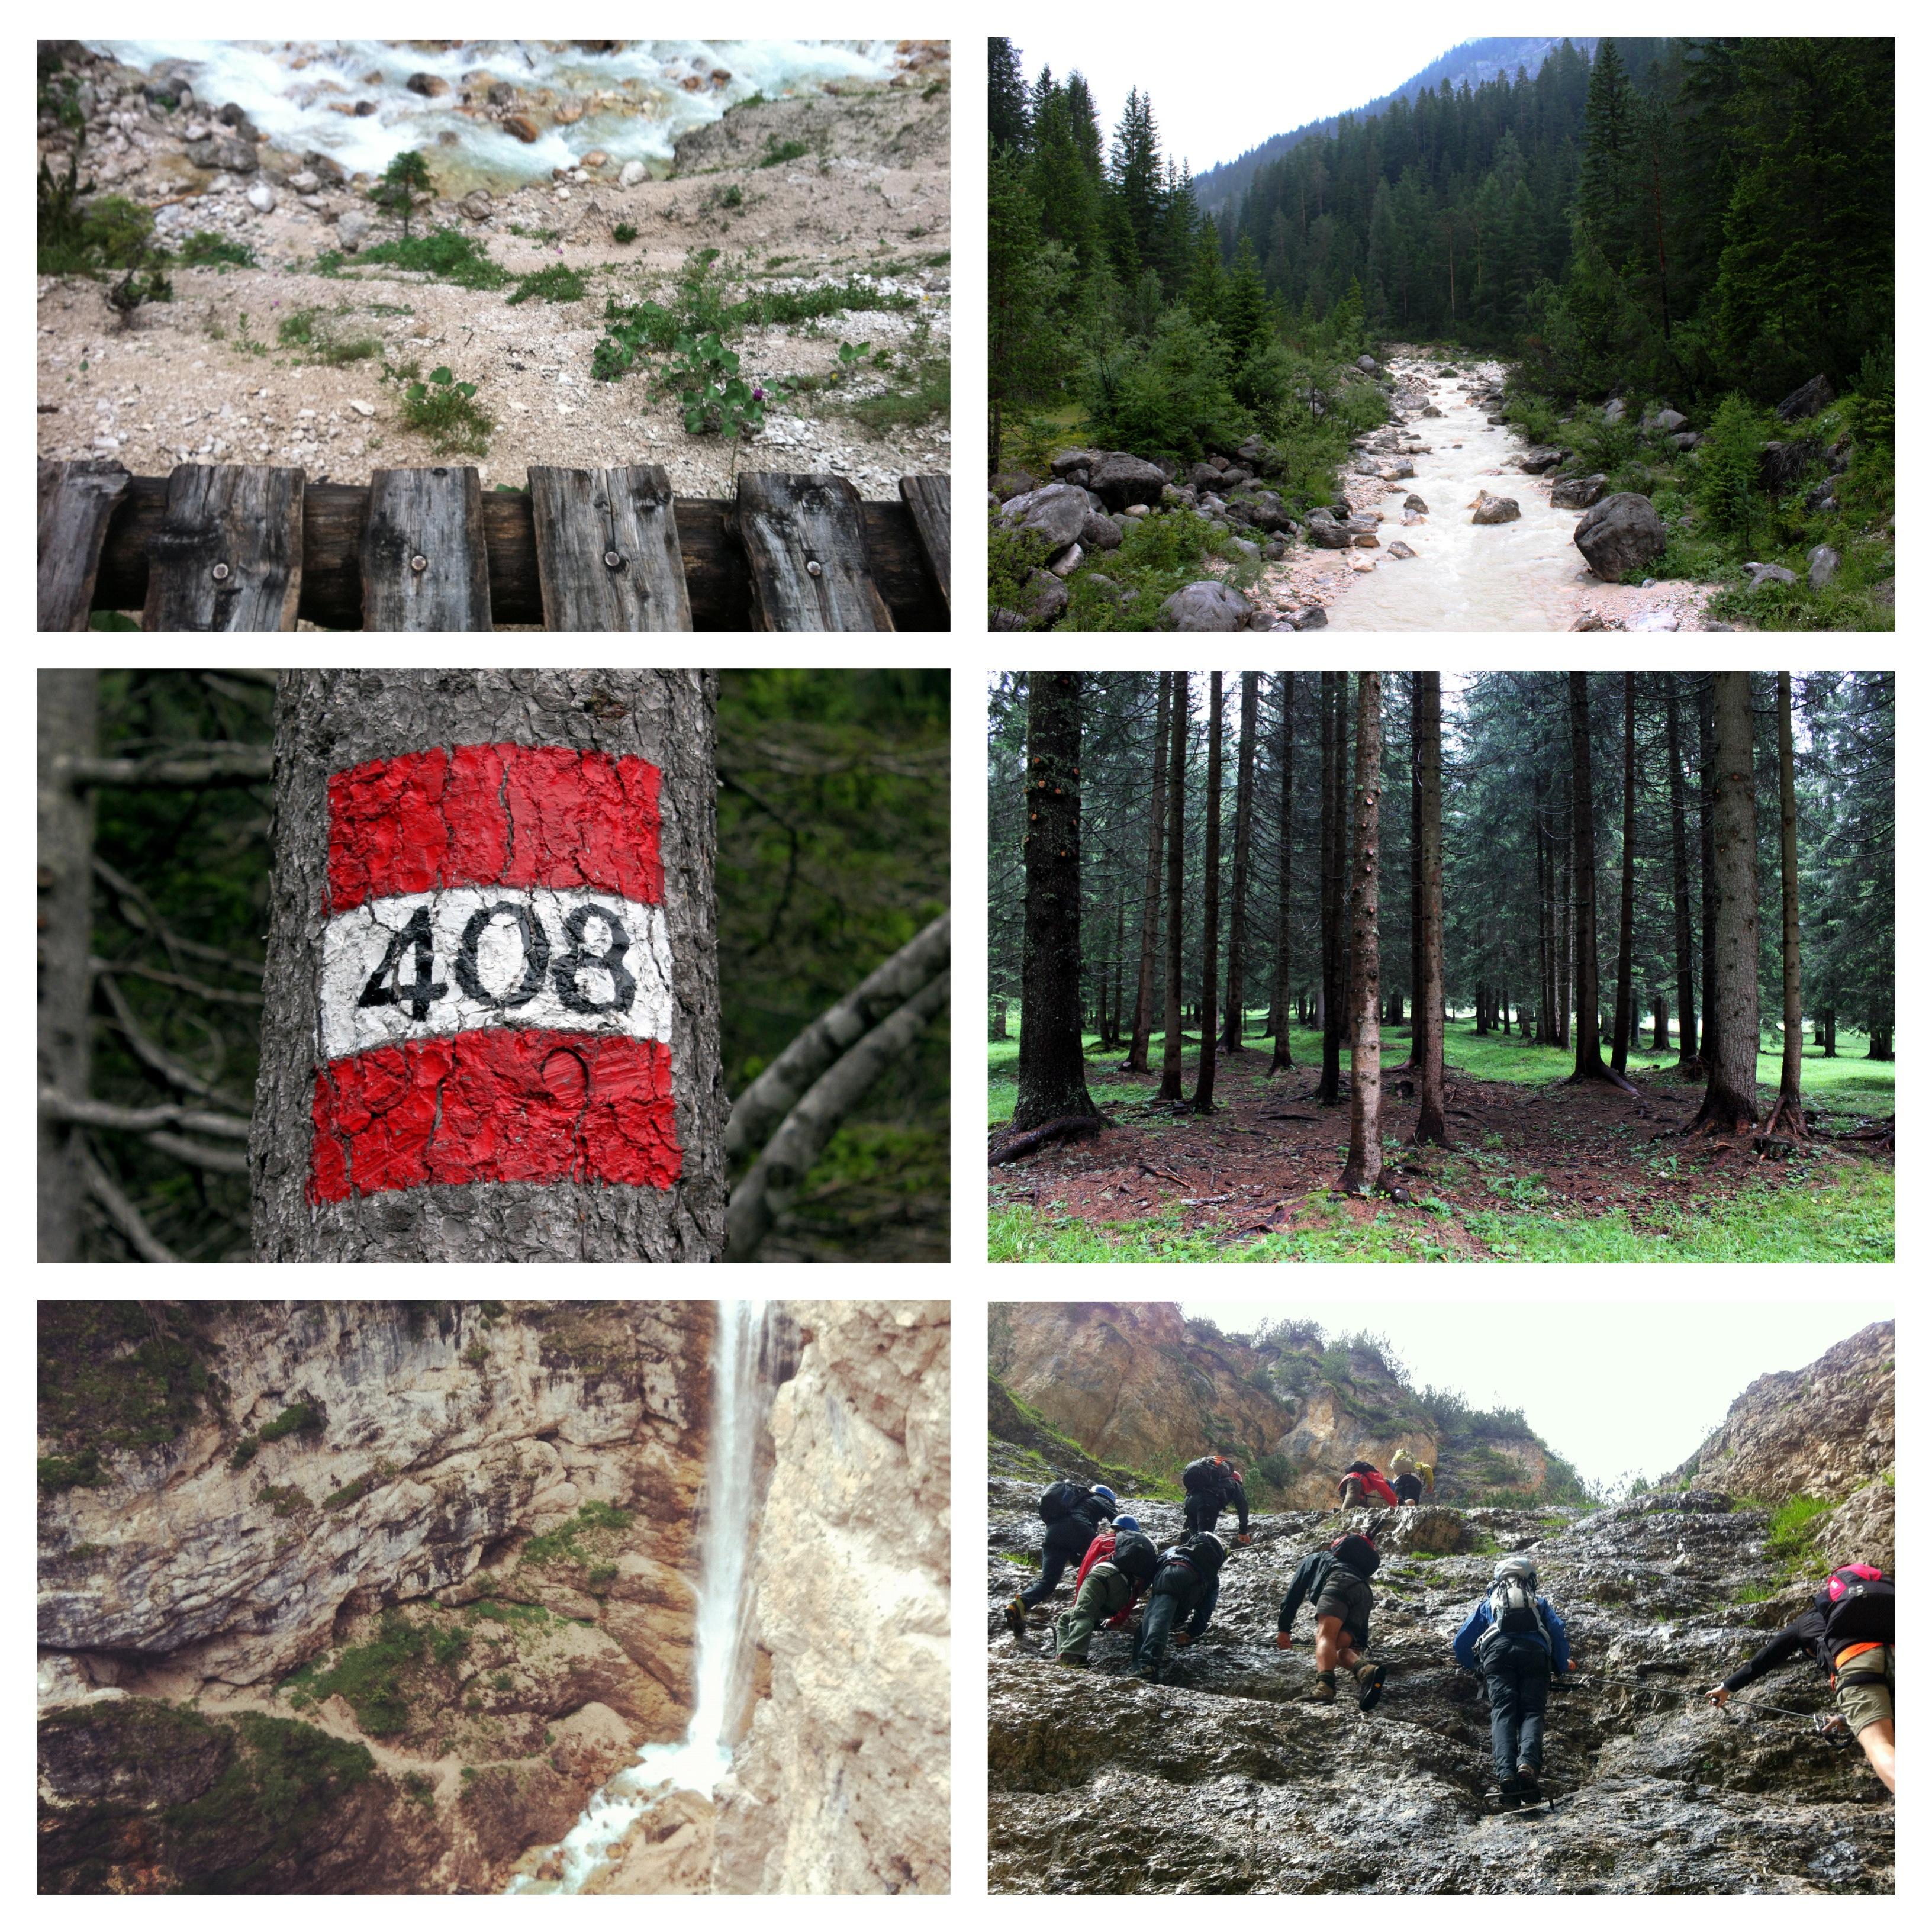 montagna cortina hiking trip dolomiti d'ampezzo cascata camminata